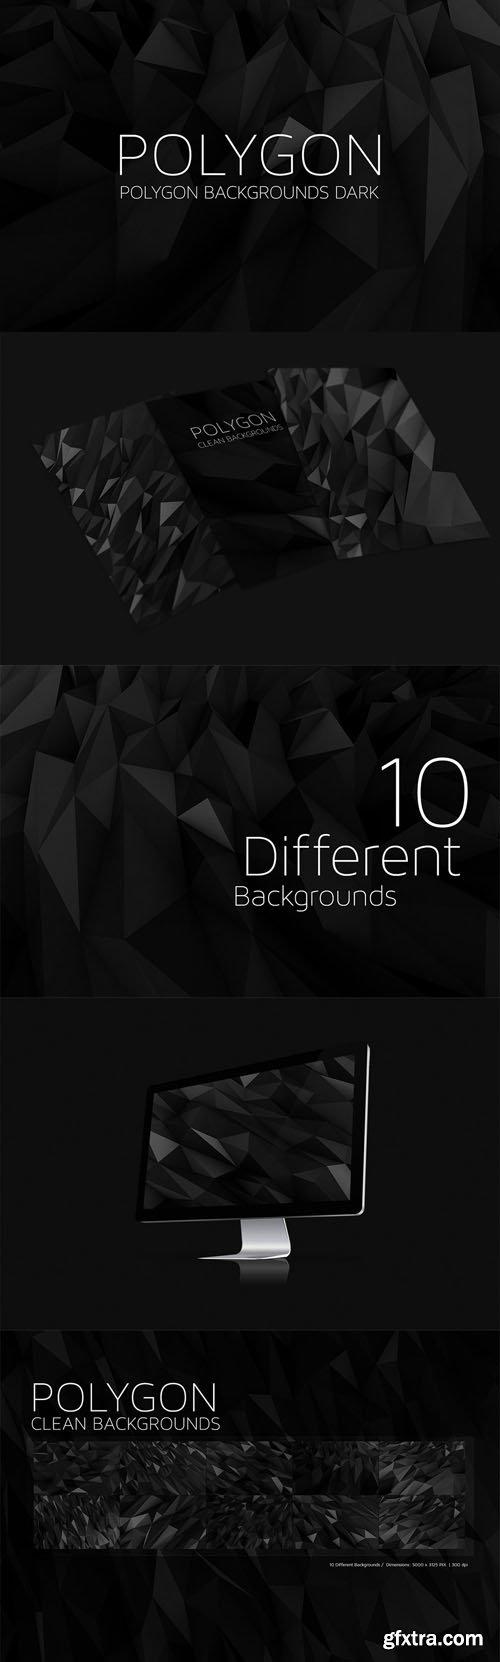 Polygon Backgrounds Dark V4 - CM 49764